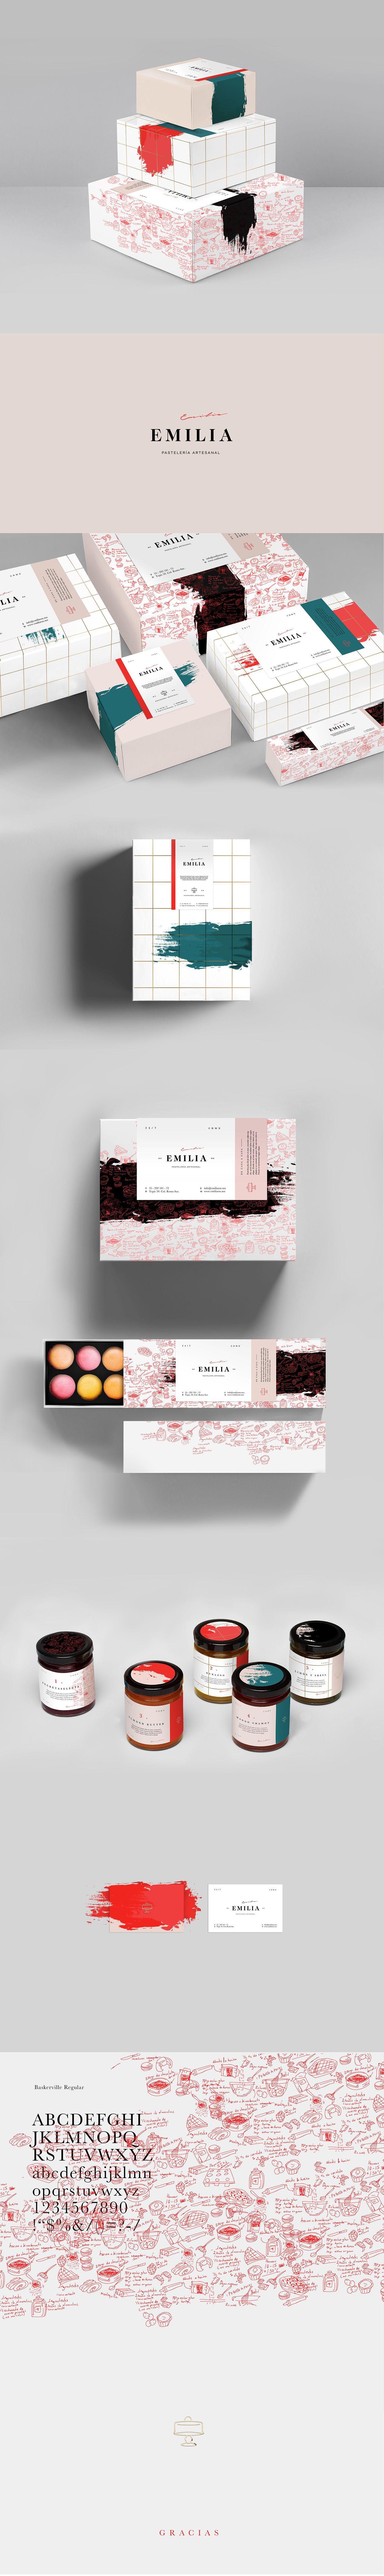 Emilia Pasteleria Artesanal Packaging by Karla Heredia Martinez | Fivestar Branding Agency – Design and Branding Agency & Curated Inspiration Gallery